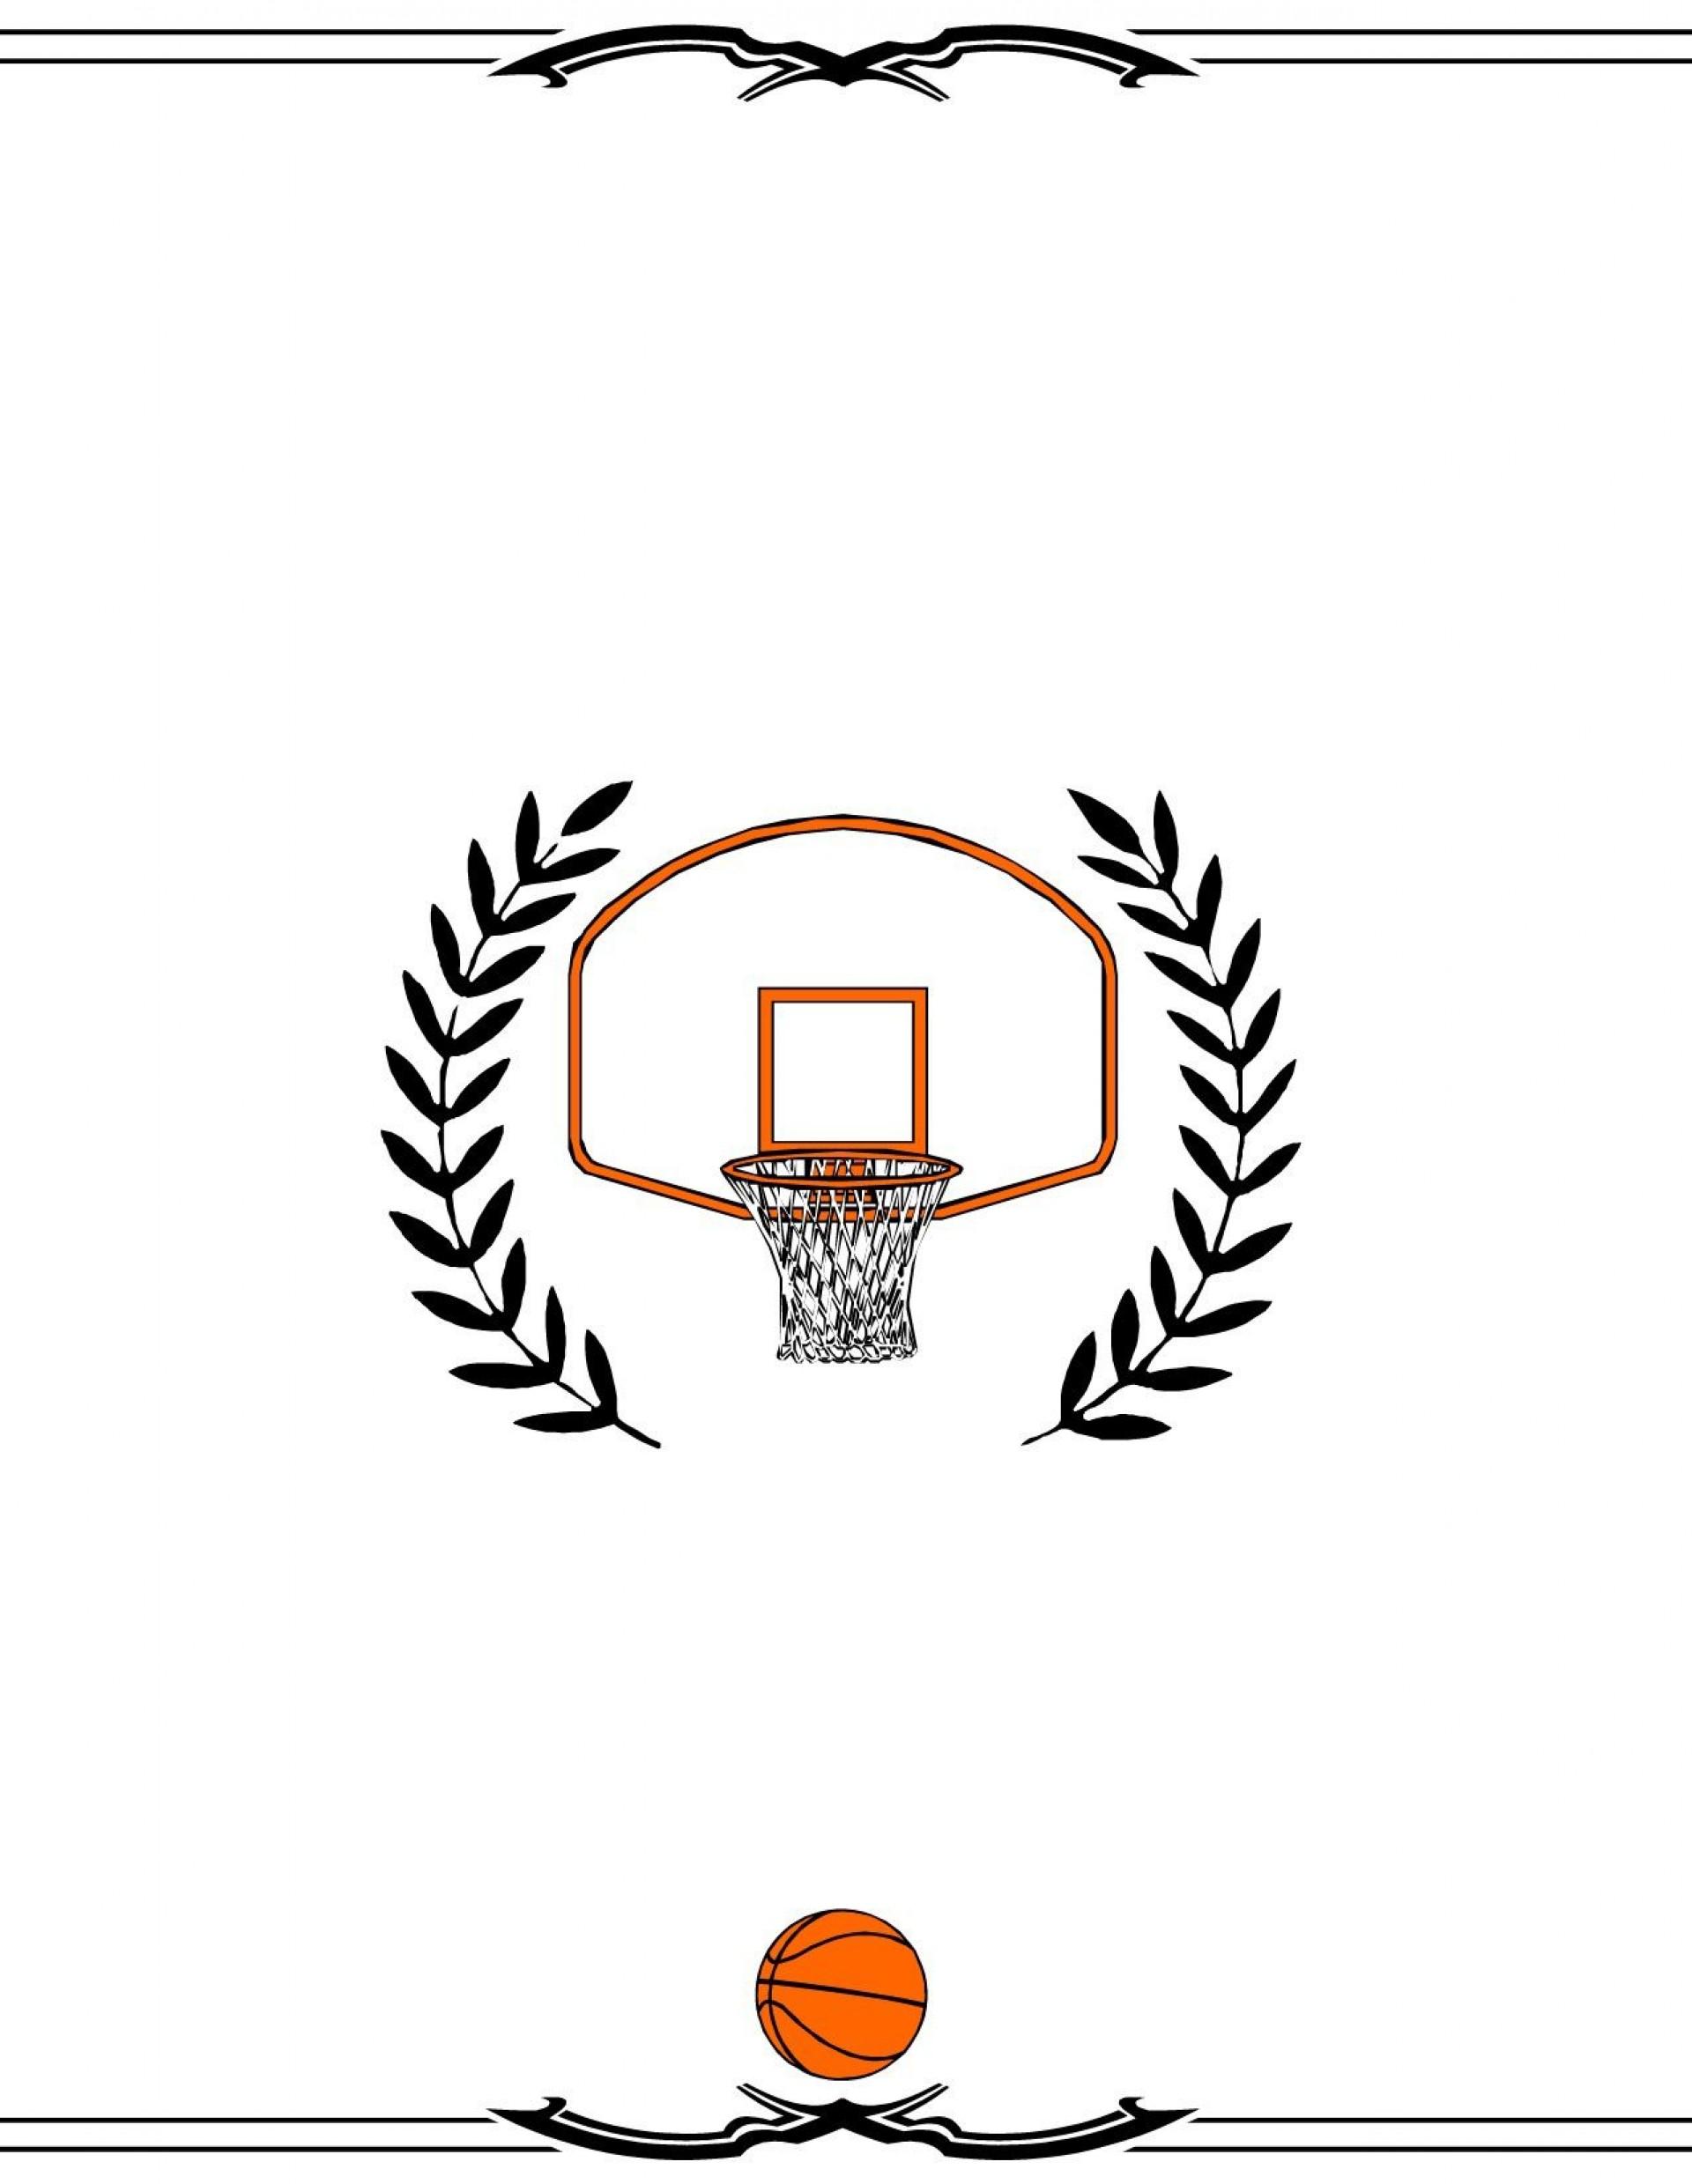 004 Astounding Free Printable Basketball Certificate Template Image  Templates1920